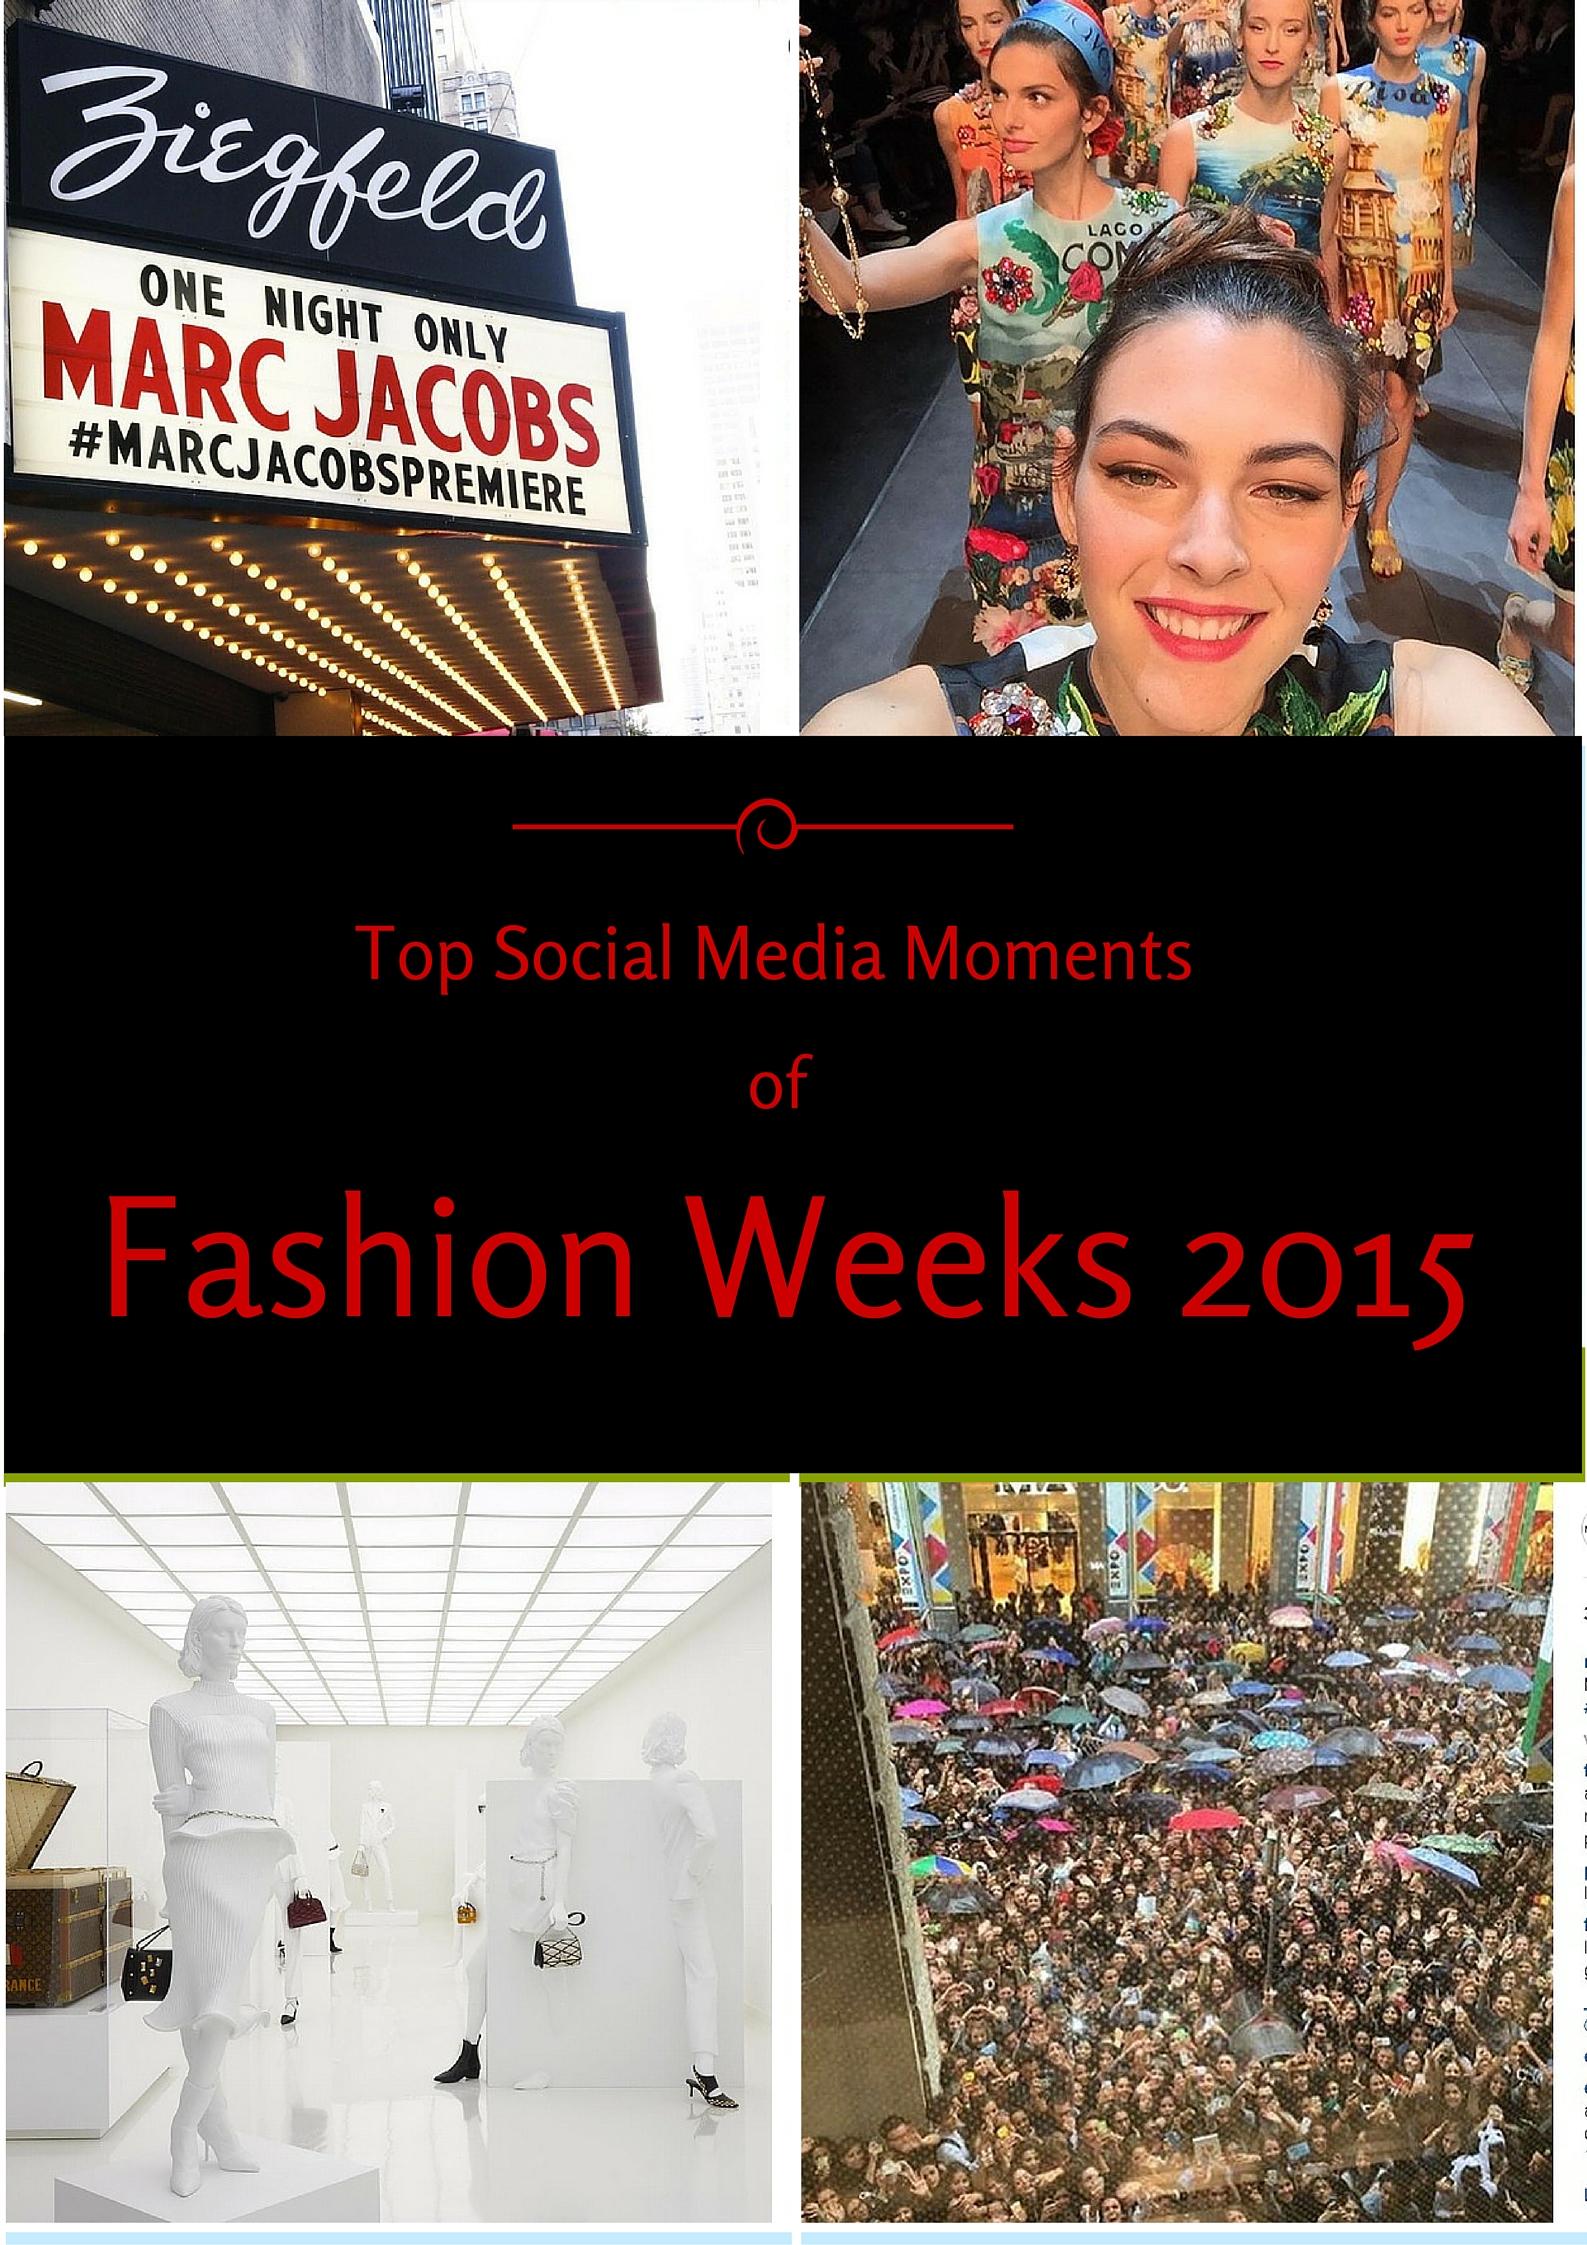 Fashion Weeks 2015